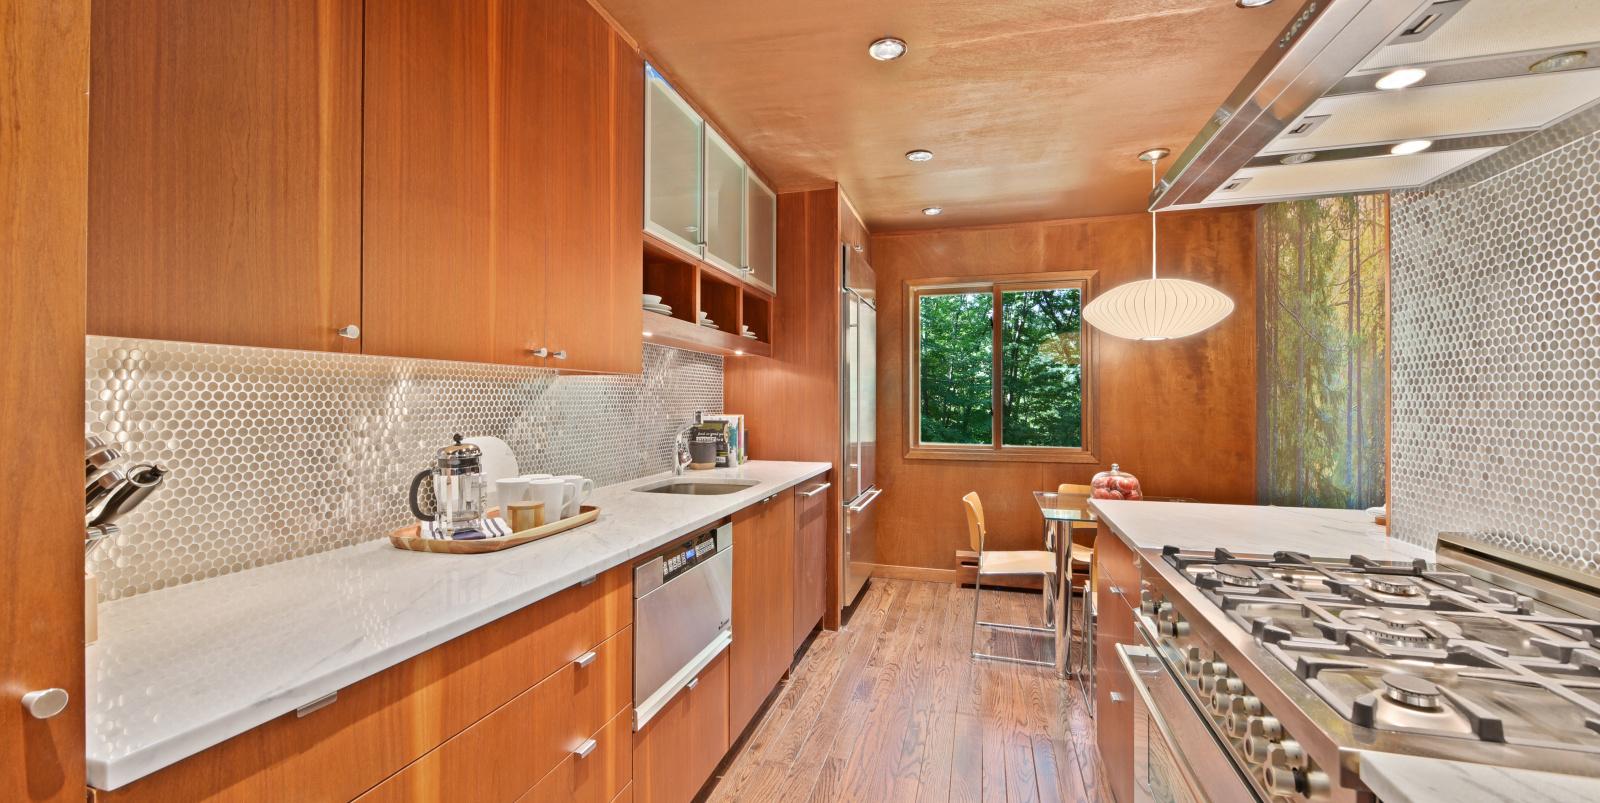 Cocina / Ginnel Real Estate